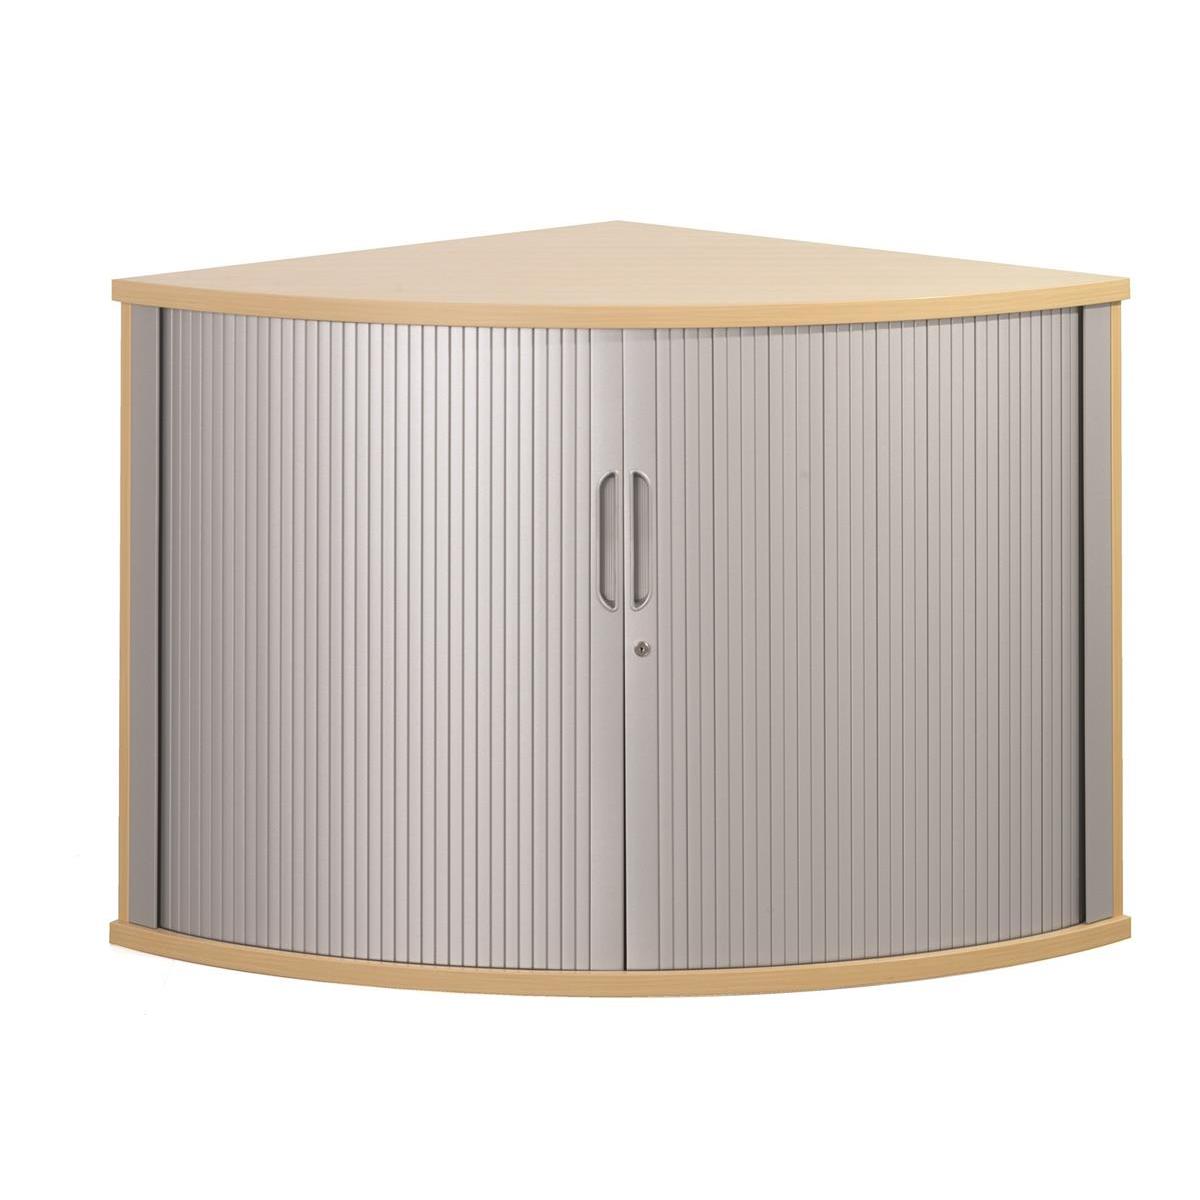 Sonix Tambour Corner Cupboard 800x800x730mm Rich Beech Ref w9050b